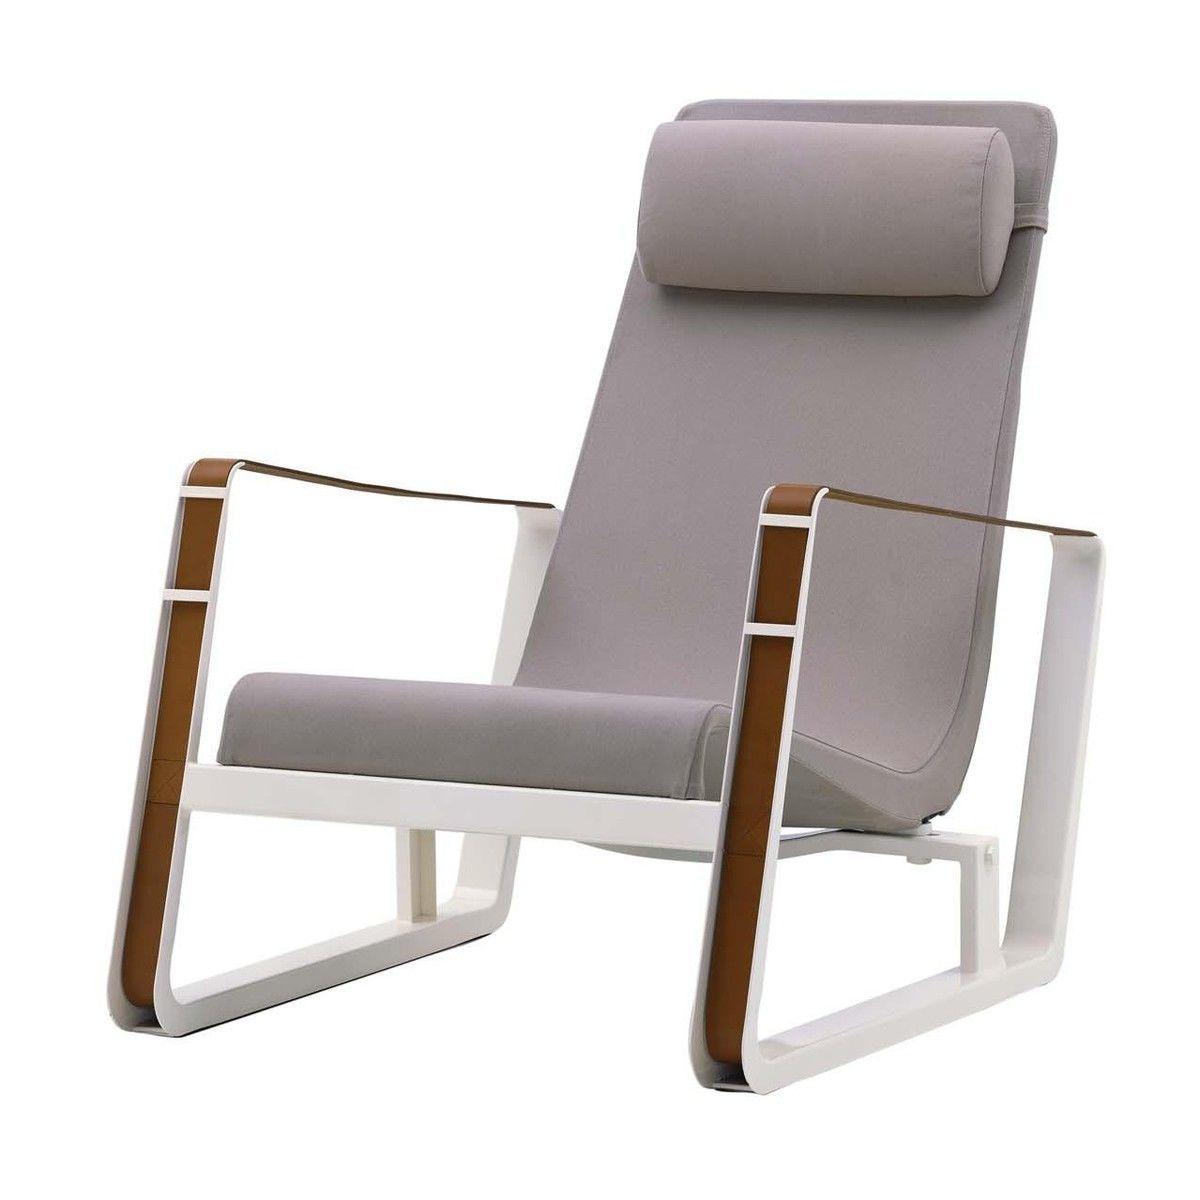 Cit prouv fauteuil vitra for Fauteuil vitra prix